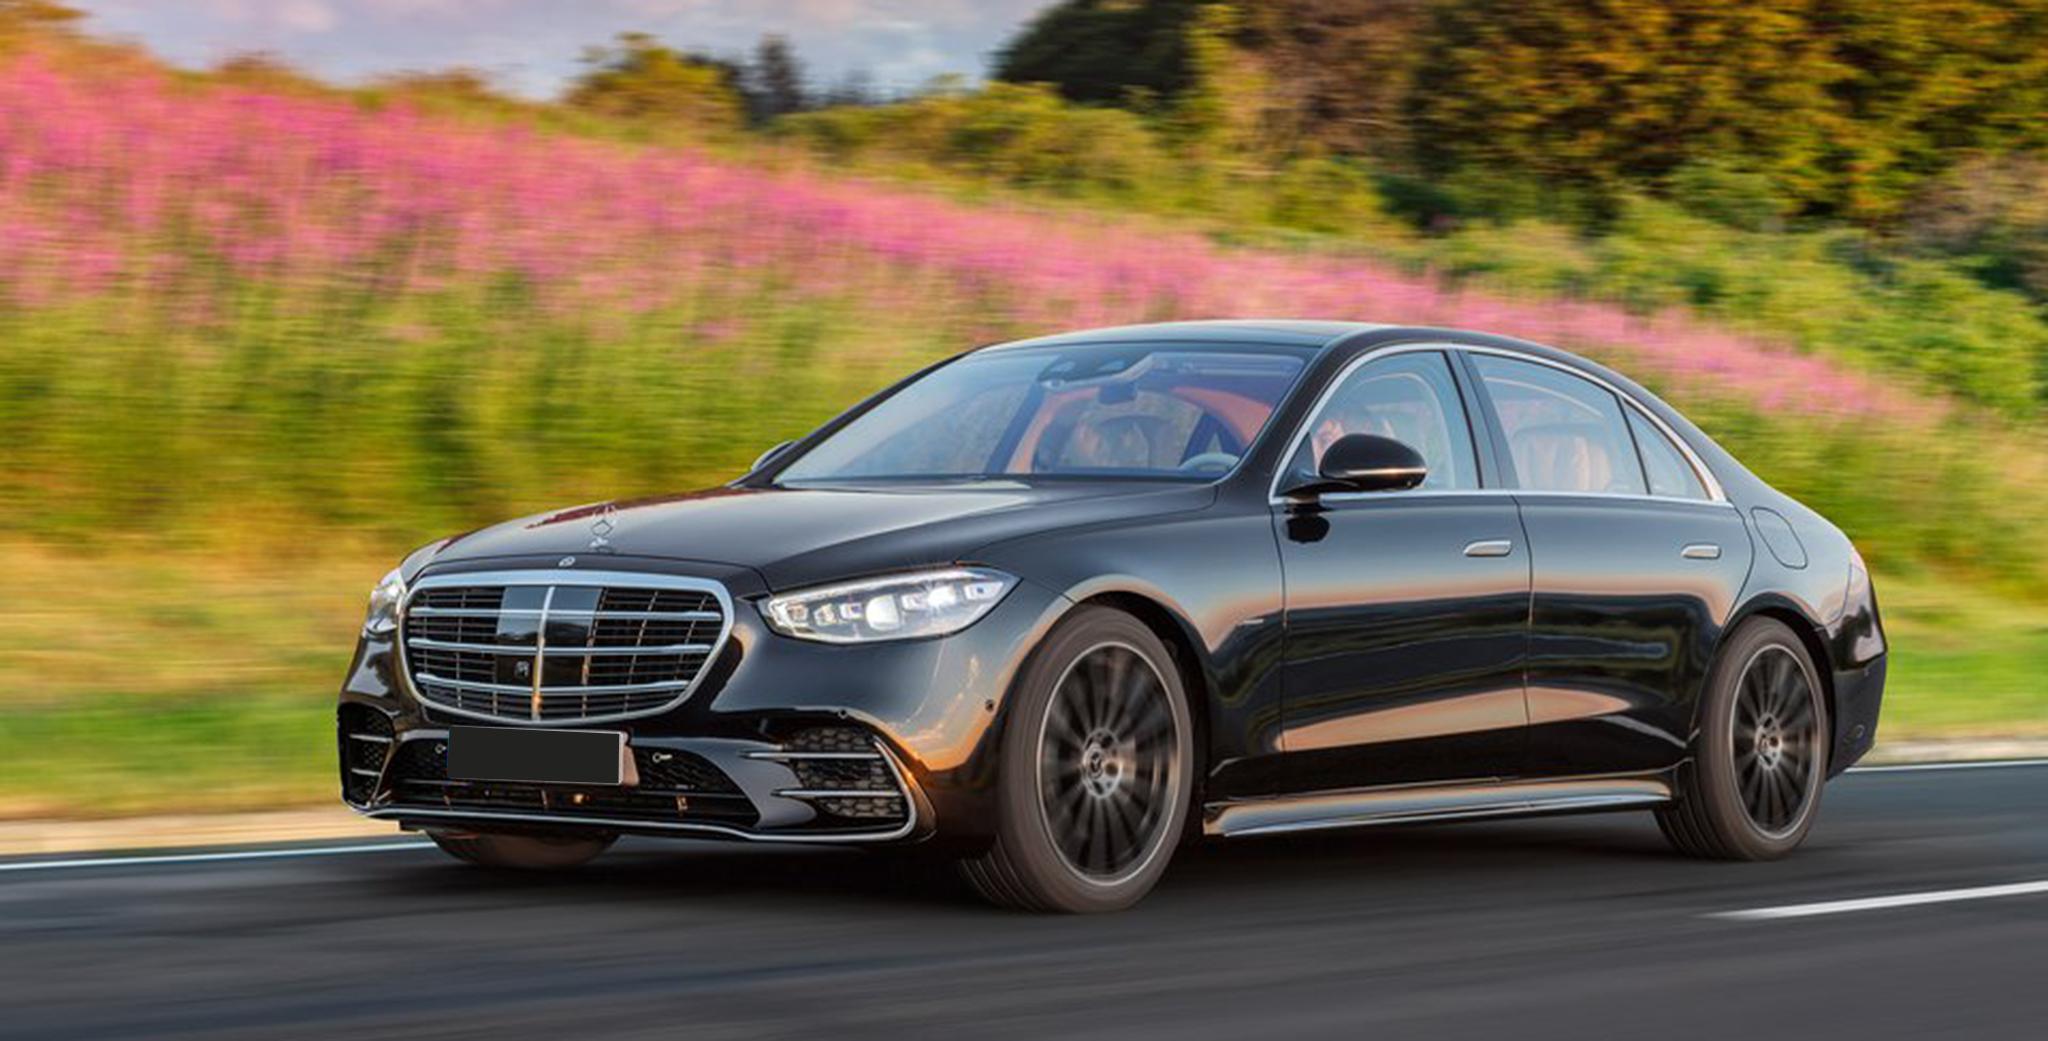 Mercedes-Benz S-Class 2021 chốt giá từ 110.000 USD - Tin ...